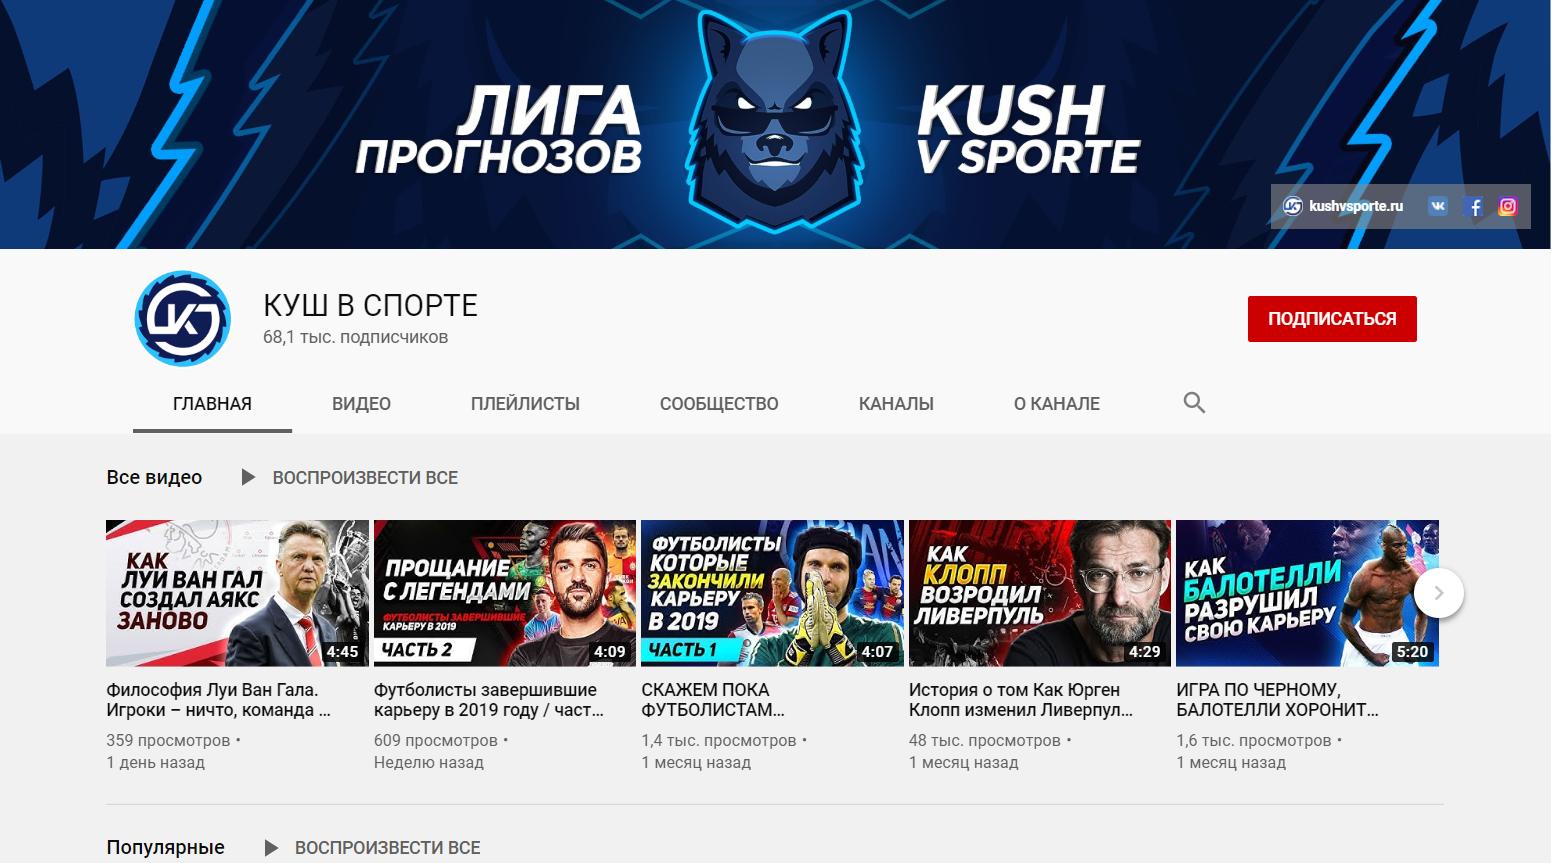 Кушвспорте YouTube